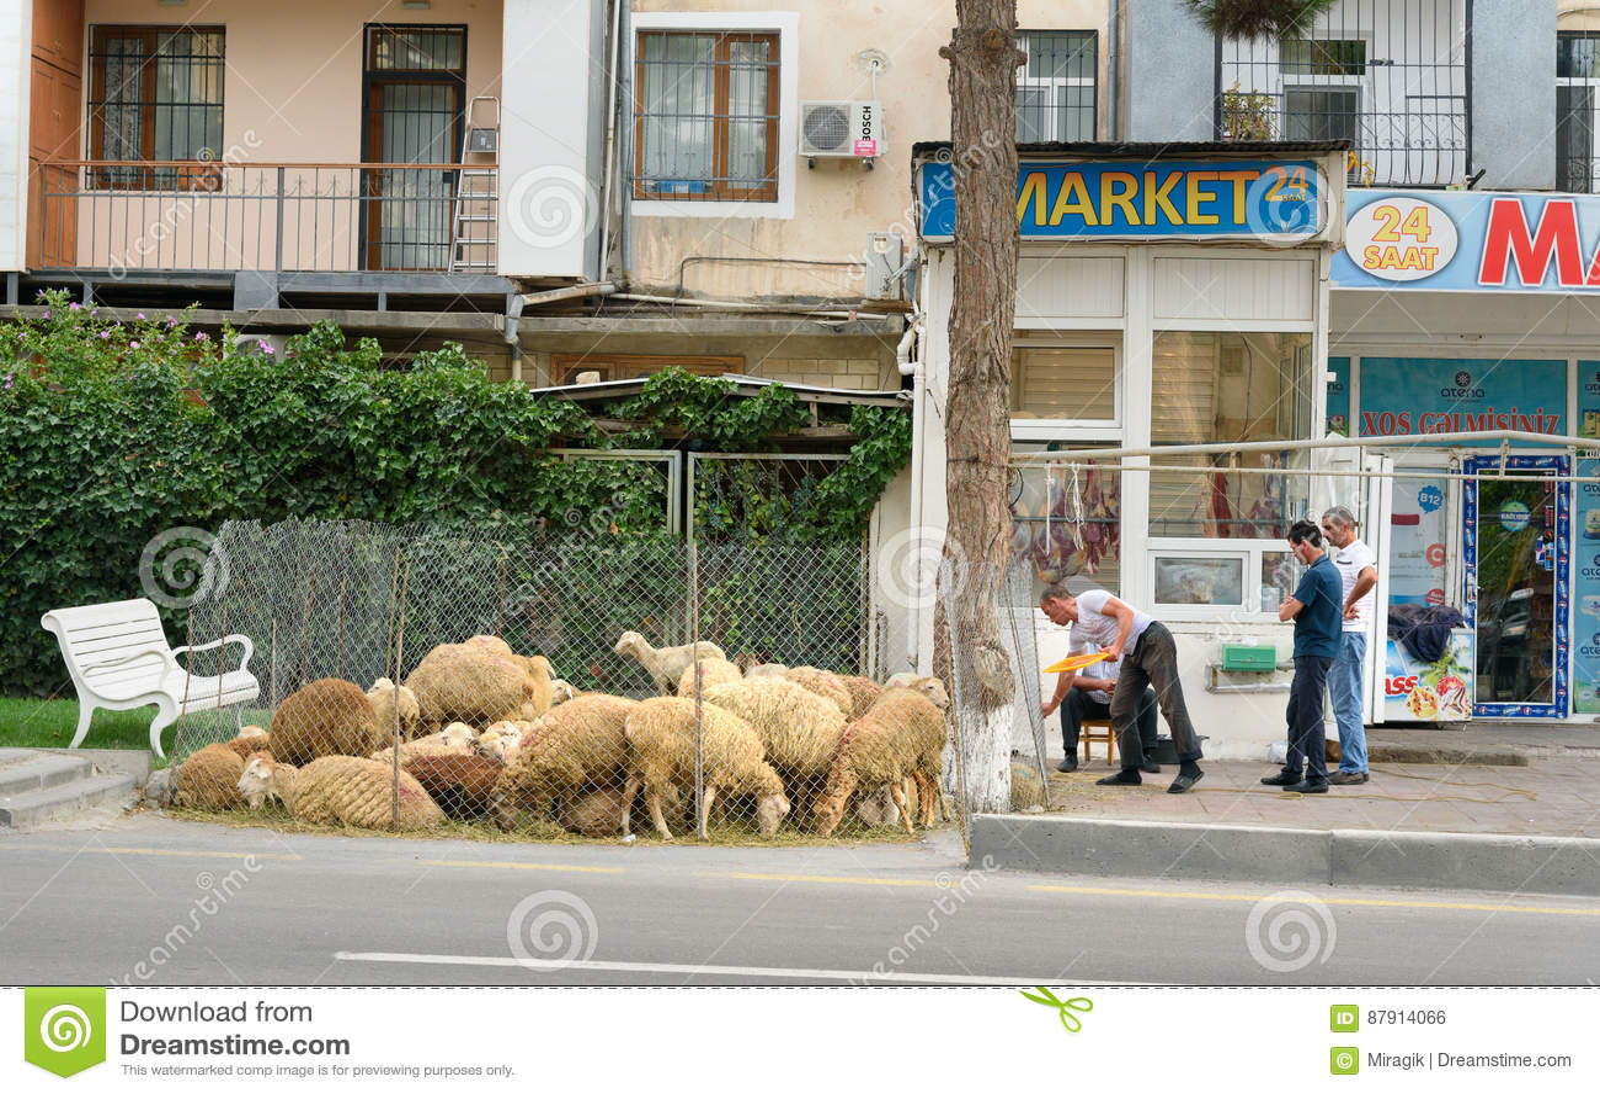 People sale sheeps during Bakrid festival Eid al-Adha. Baku